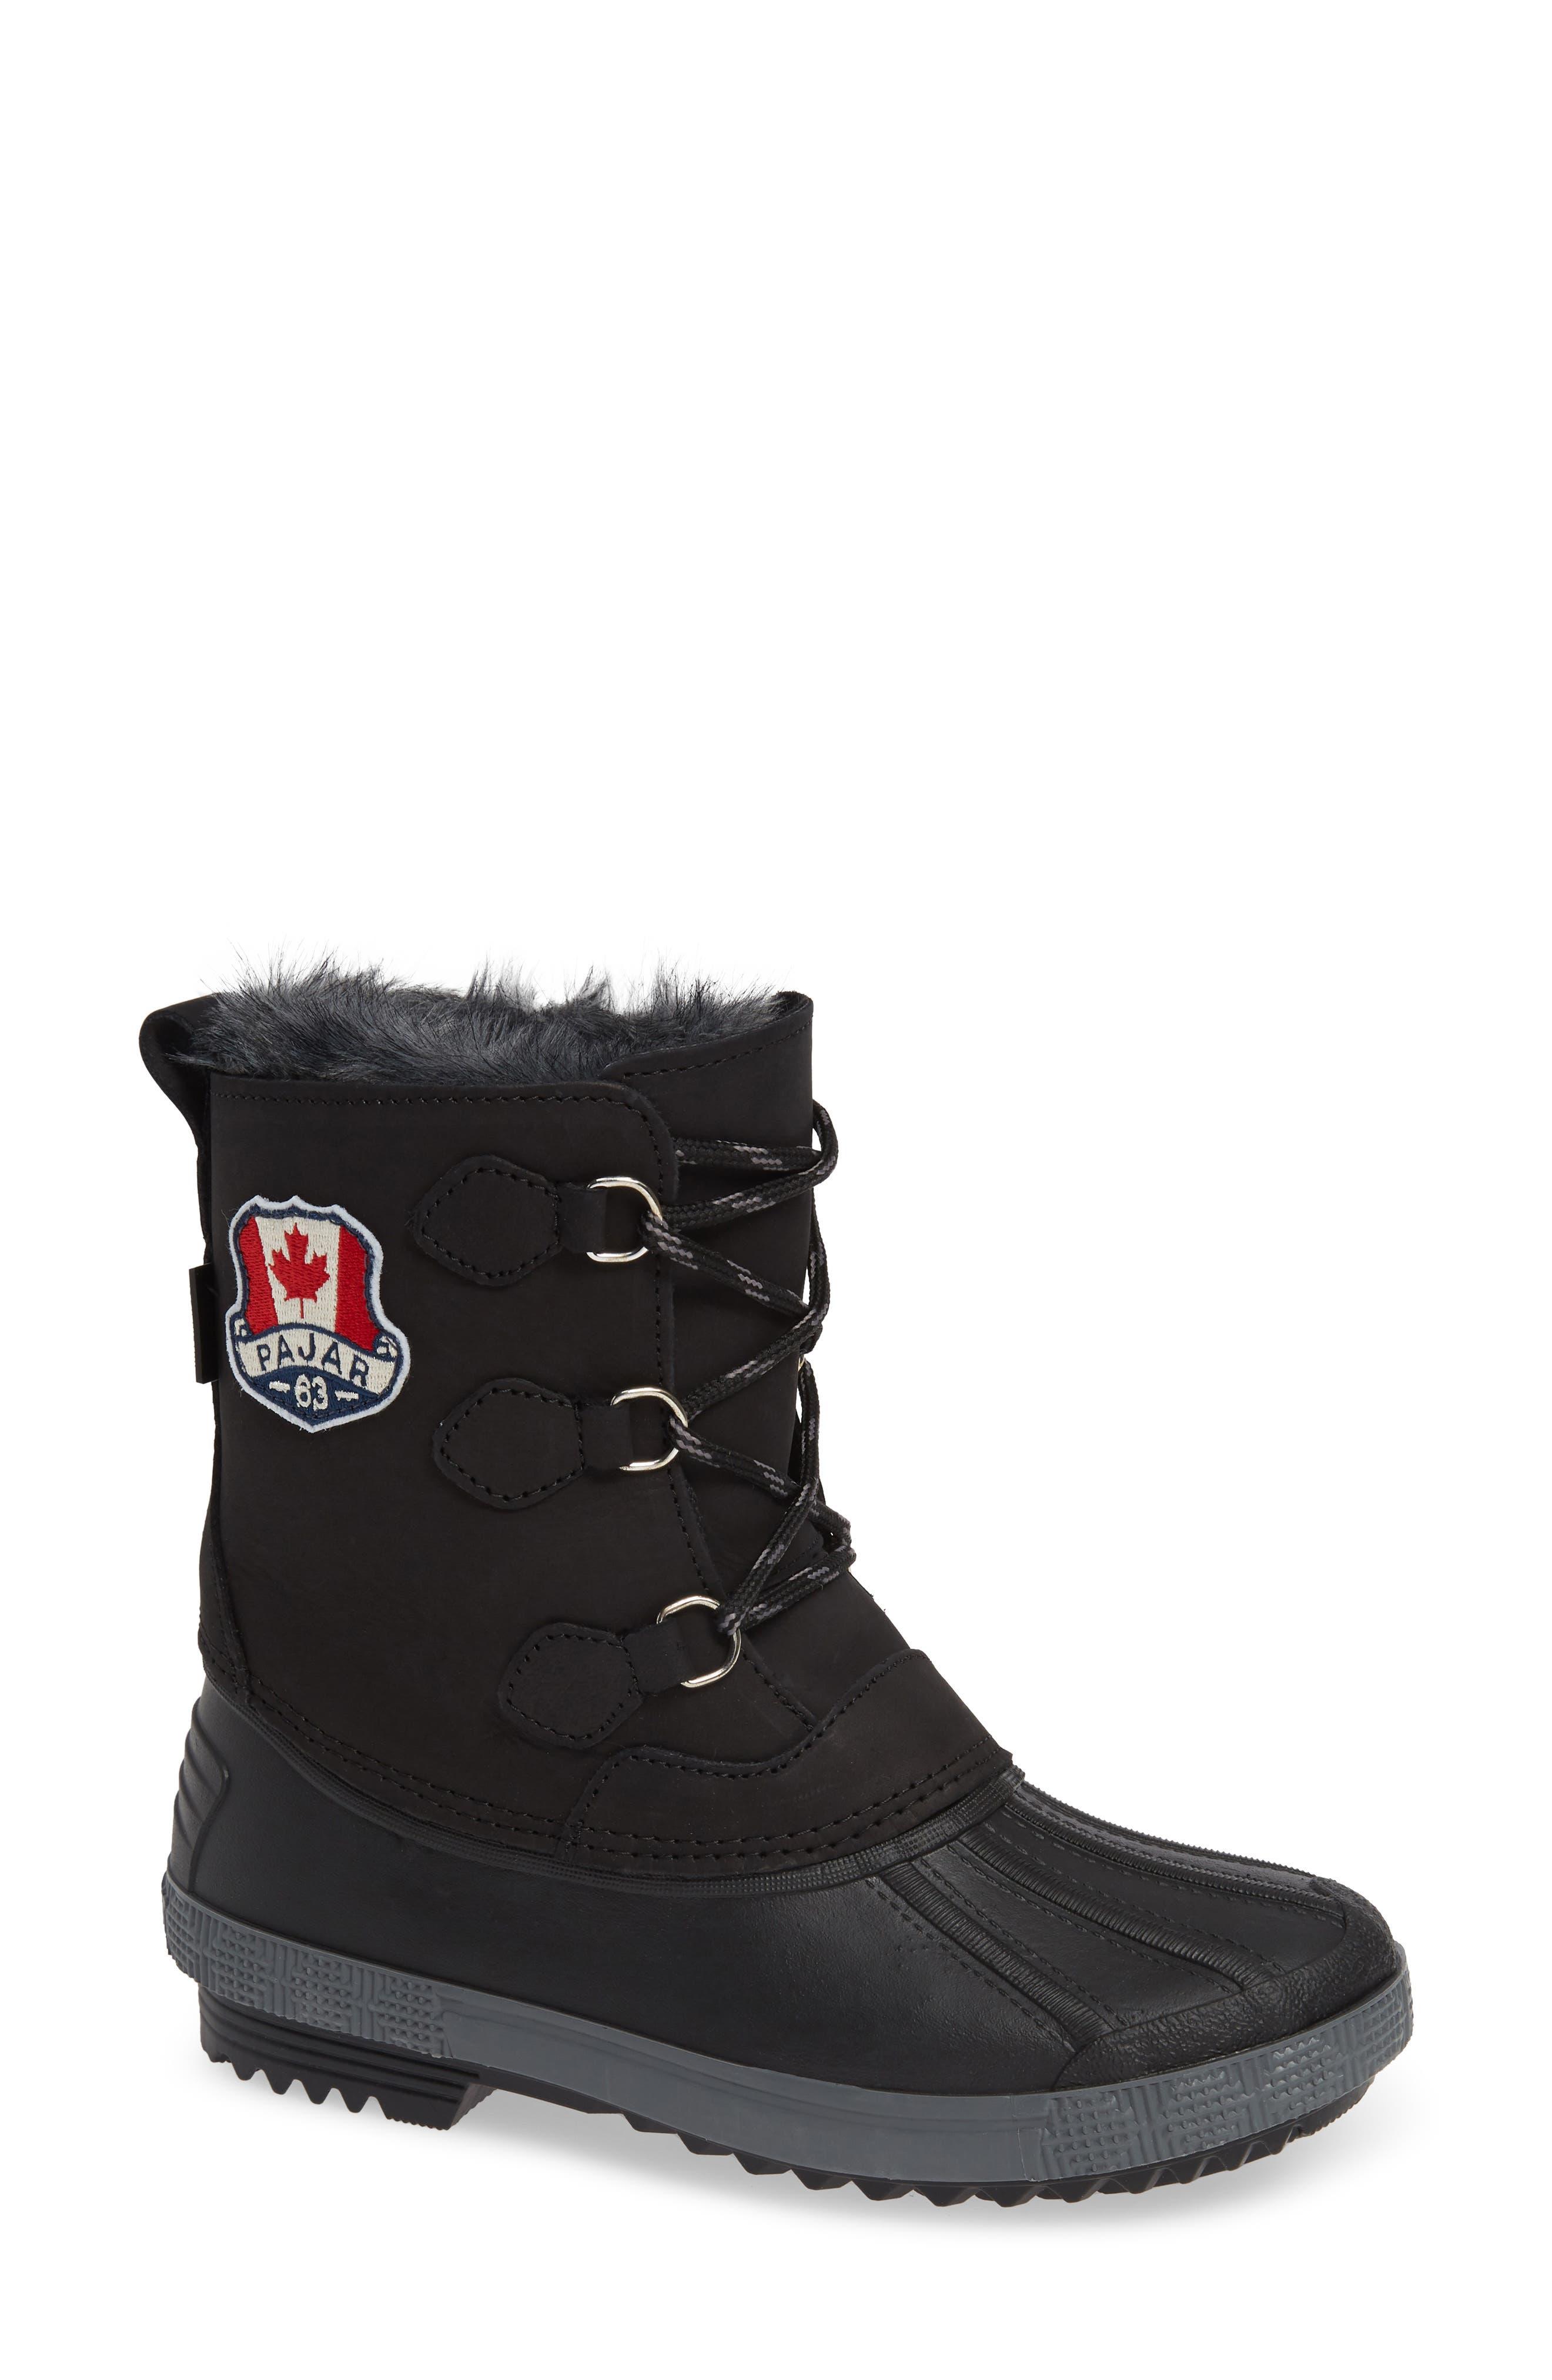 Cali Waterproof Insulated Boot, Main, color, BROWN/ BLACK